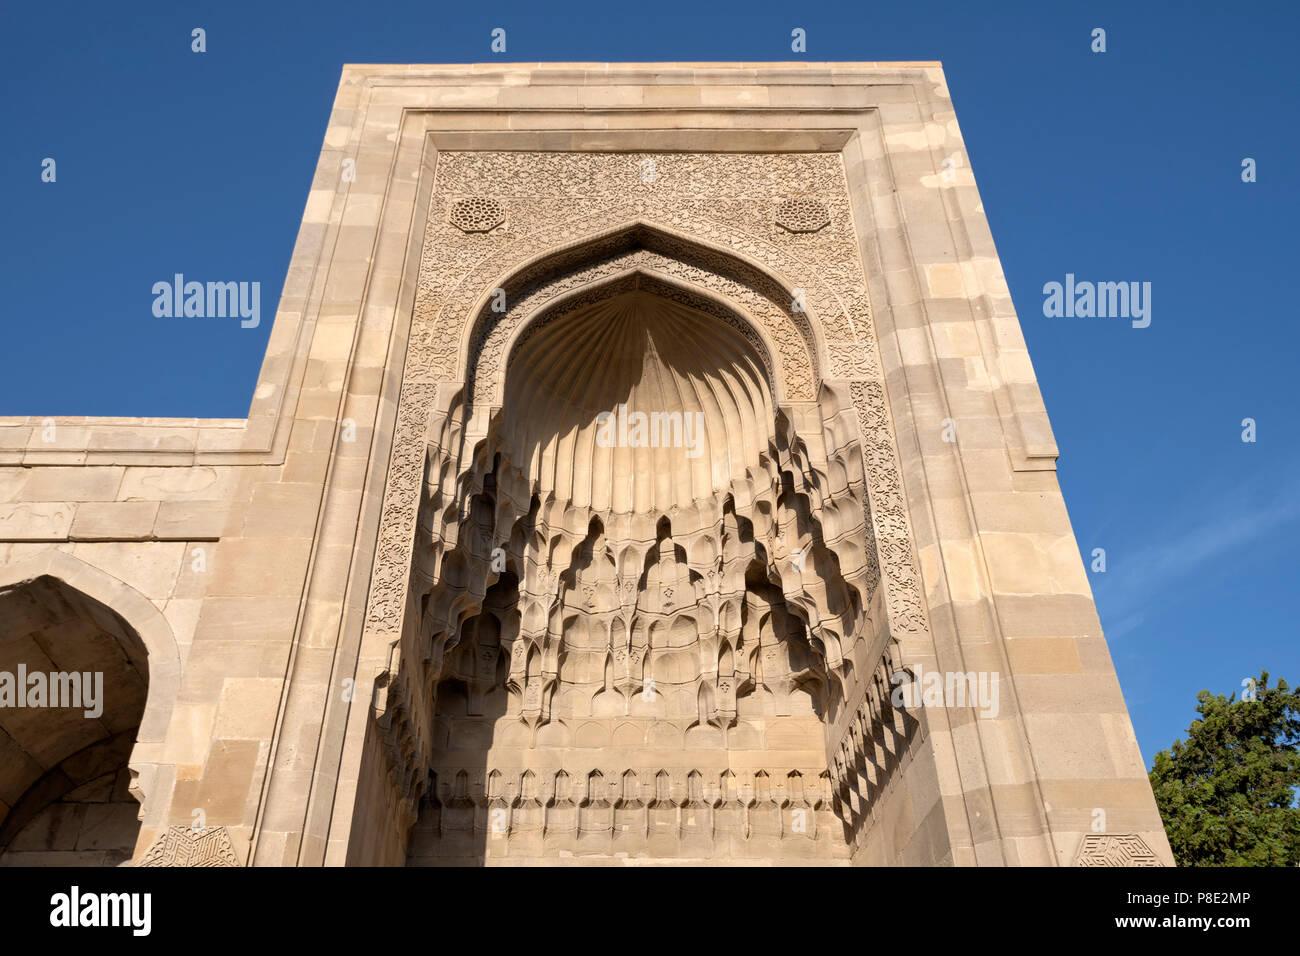 Divankhana Entrance in The Palace of the Shirvanshahs , Baku, Azerbaijan - Stock Image